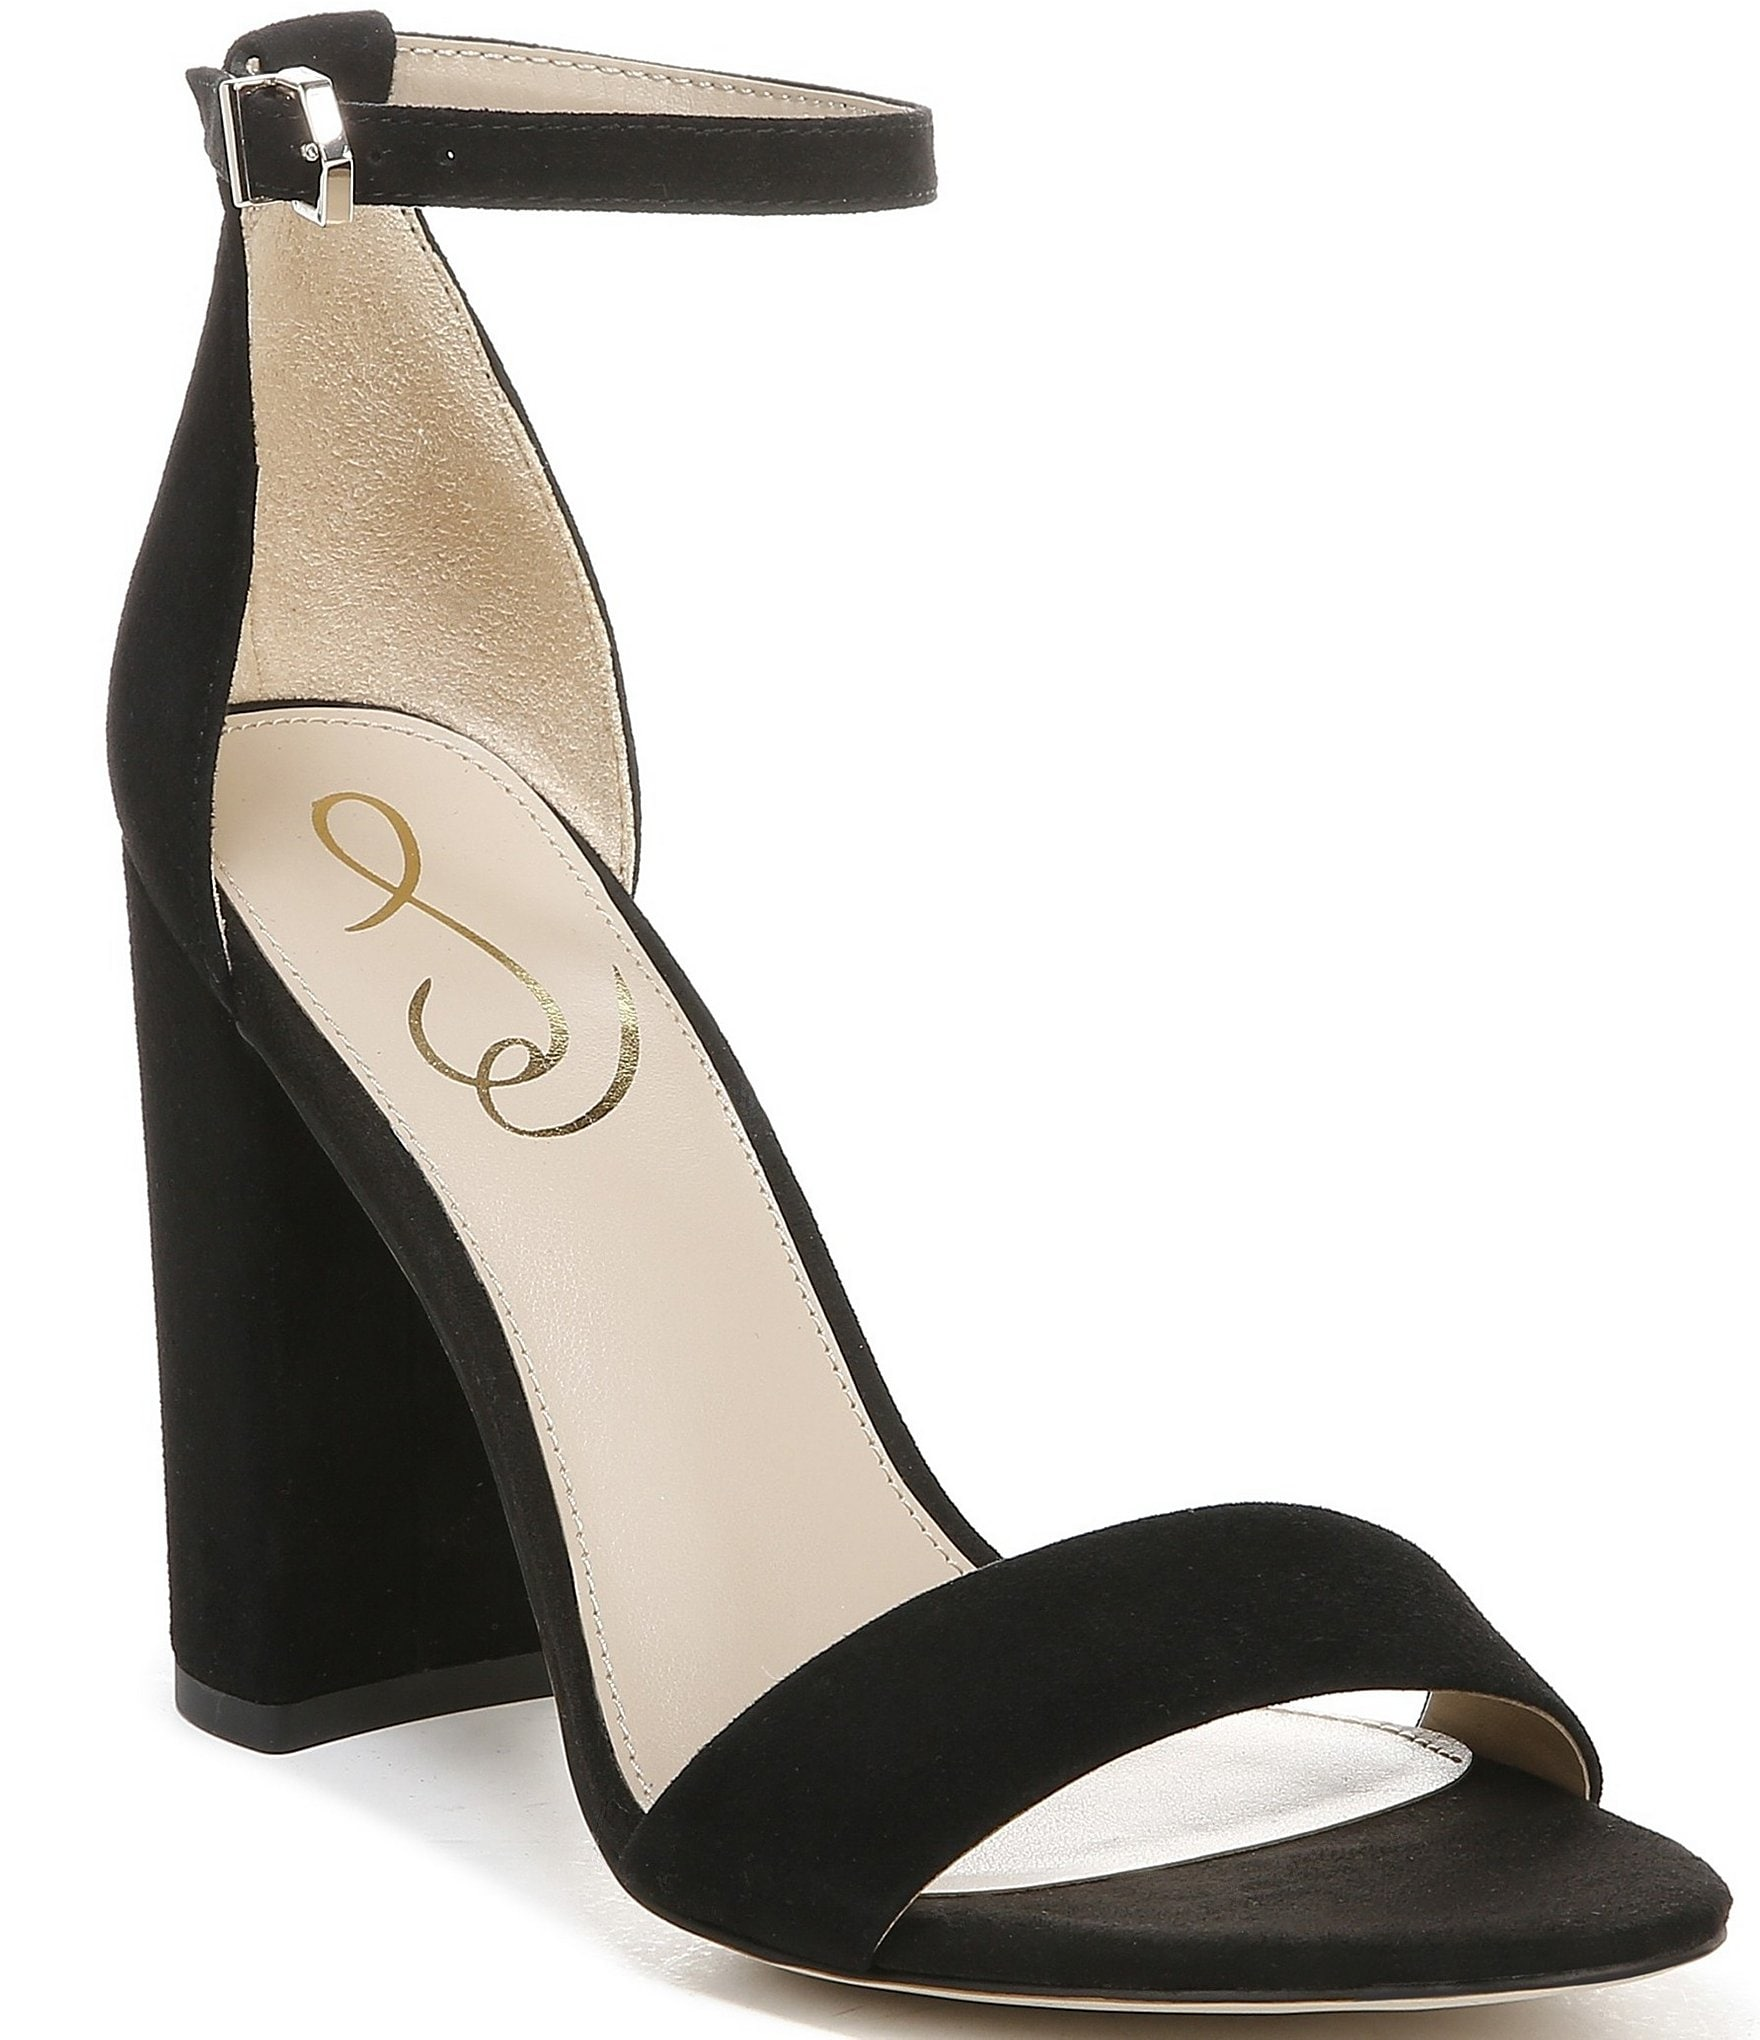 Yoshi Beaded Suede Dress Sandals KgqJ1iz